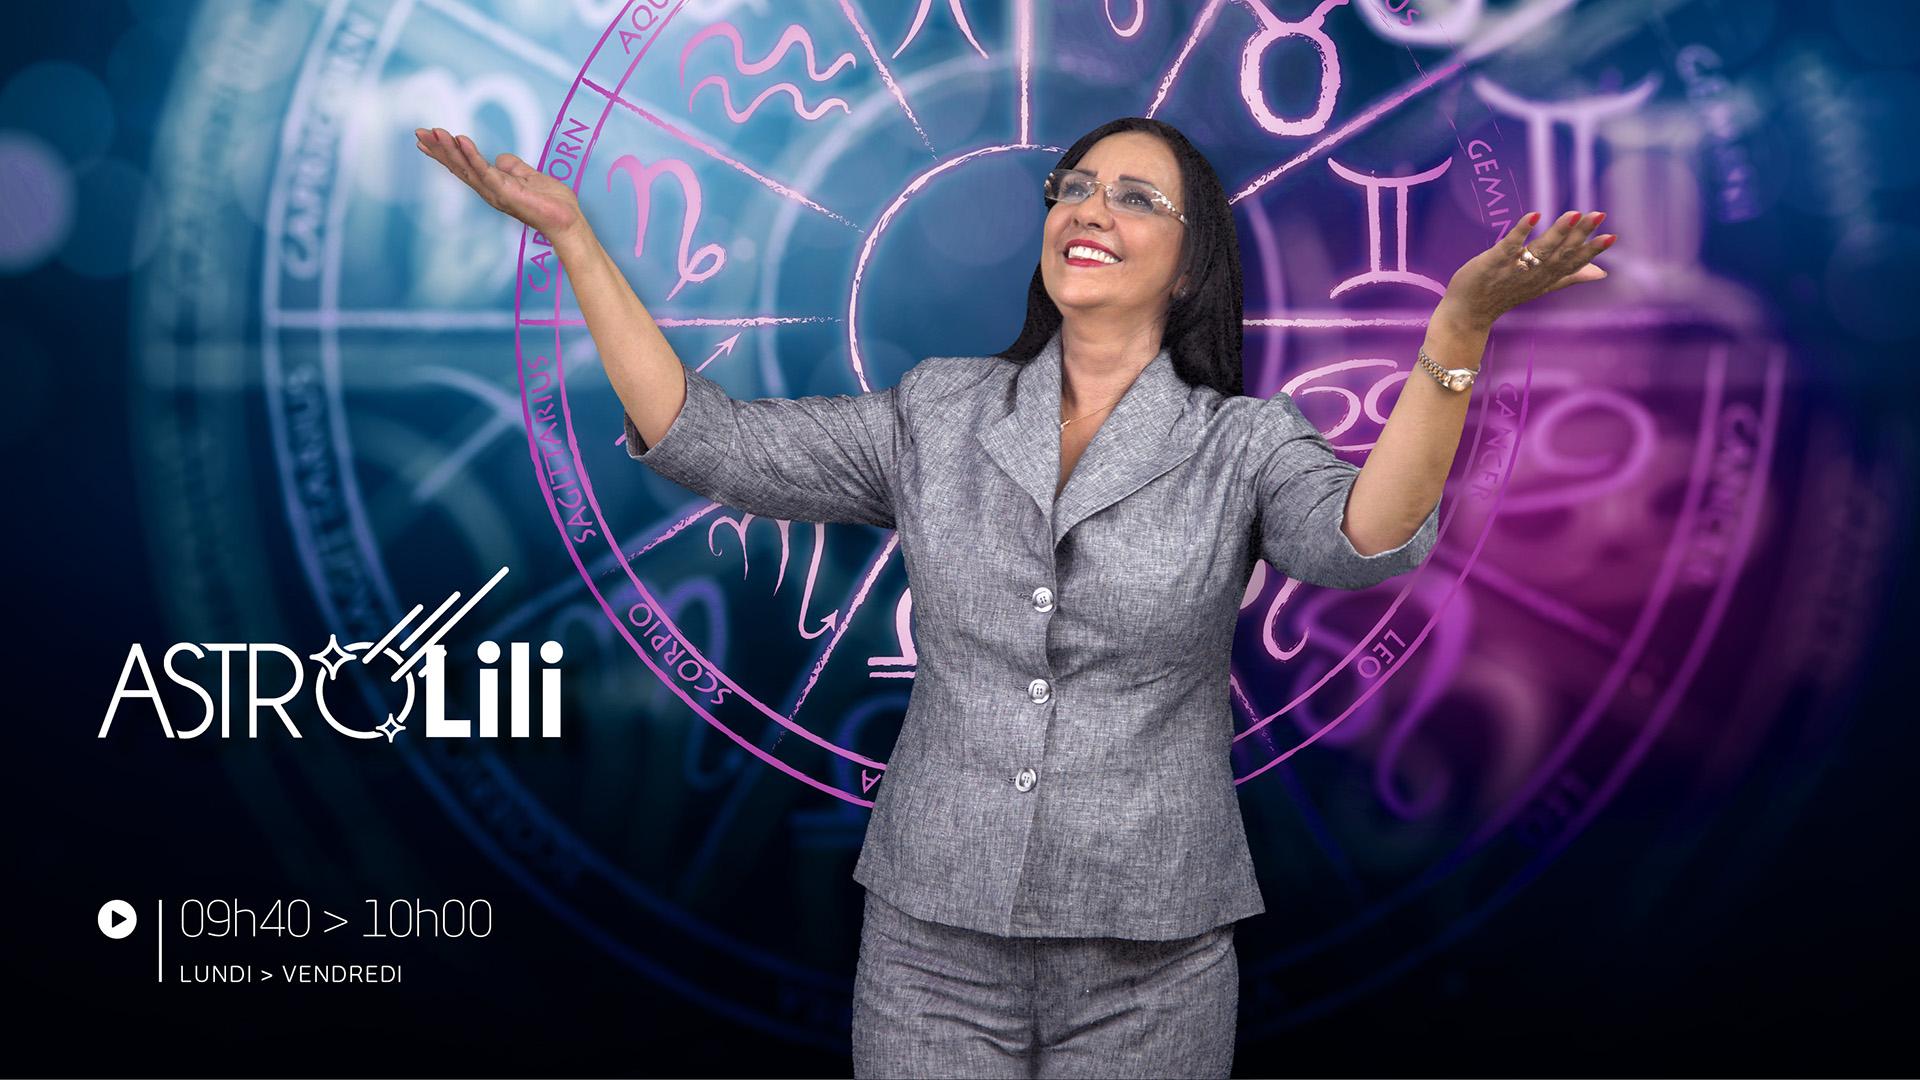 Astro Lili du Mercredi 03 juin 2020